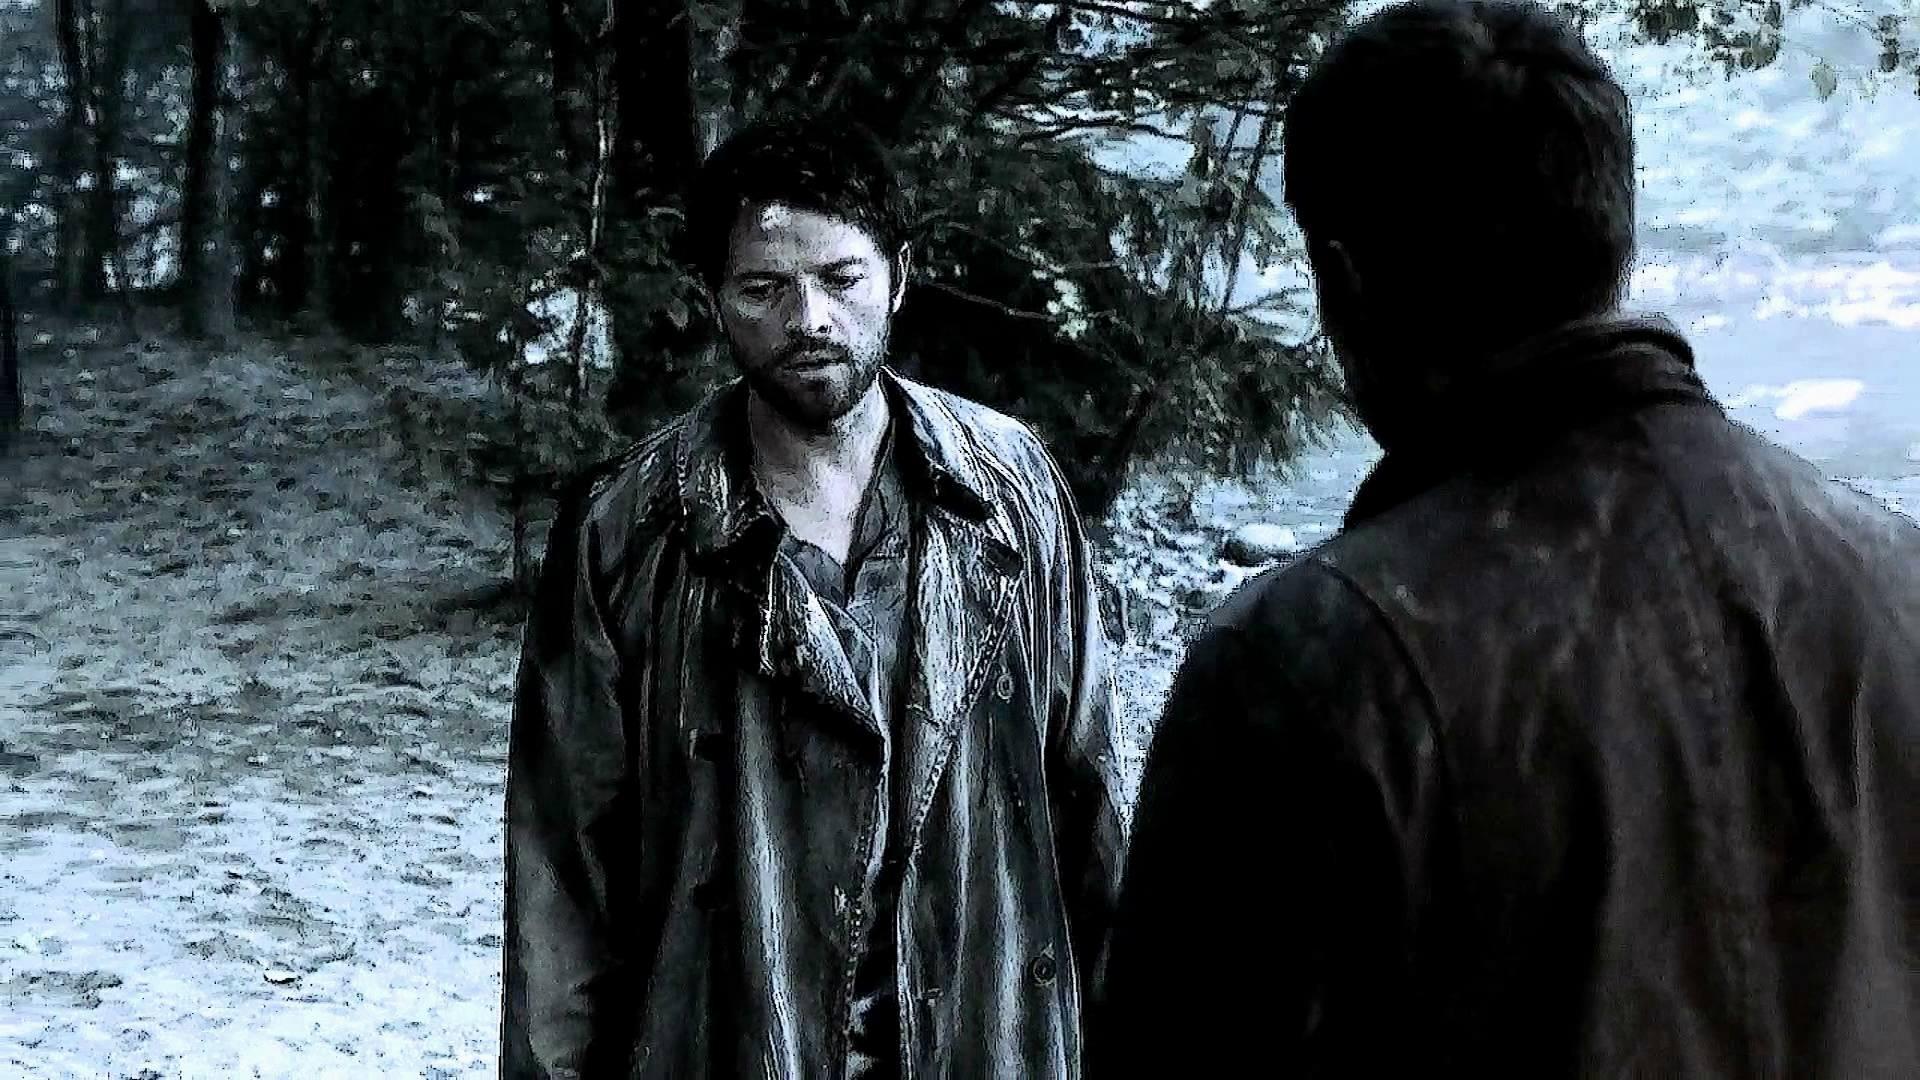 Castiel-Supernatural-Iphone-Images